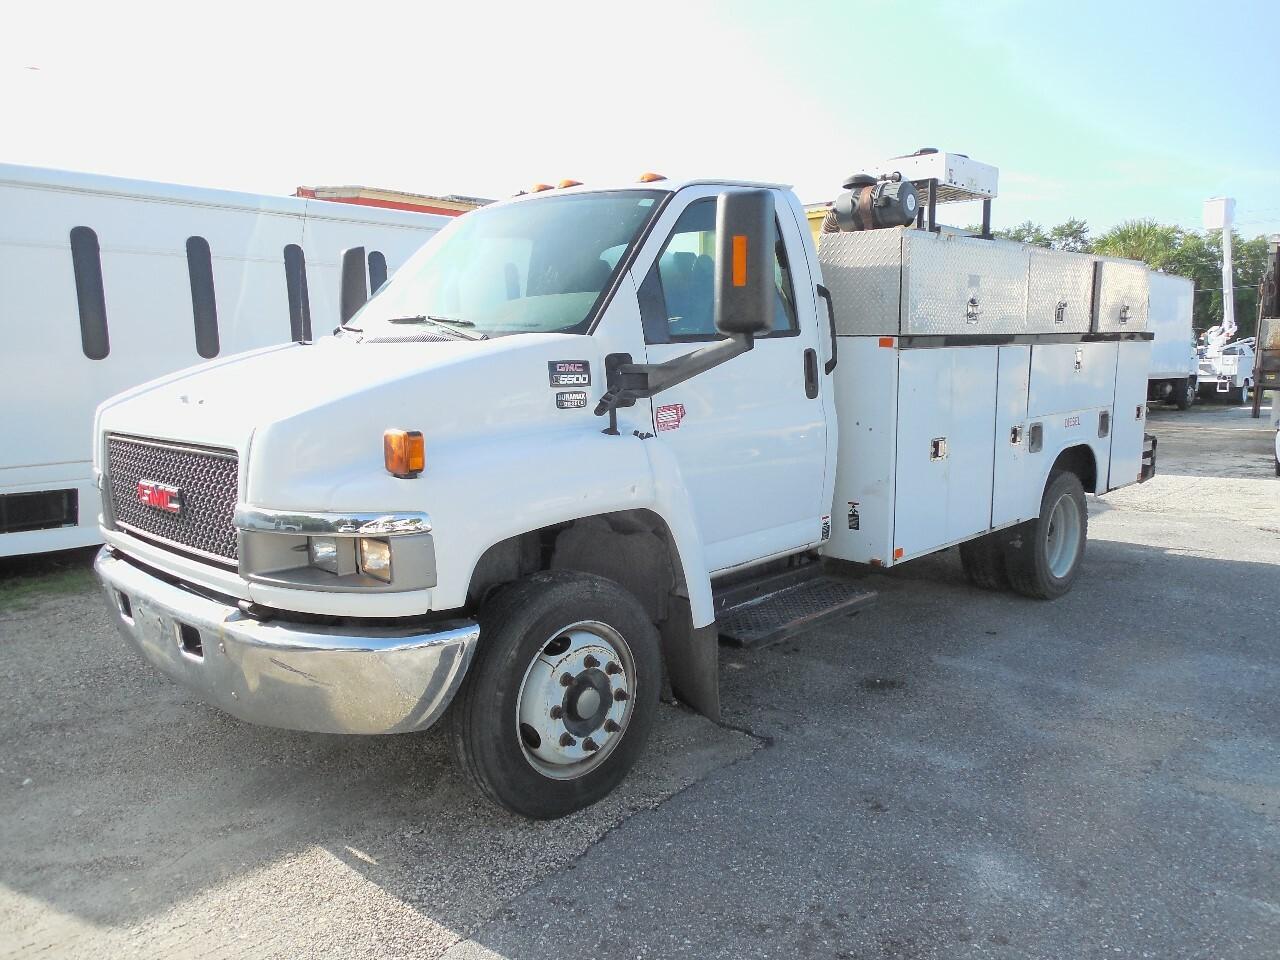 C5500 For Sale Gmc Truck Mercial Traderrhmercialtrucktrader: 2007 Gmc Topkick C5500 Fuel Filter At Gmaili.net